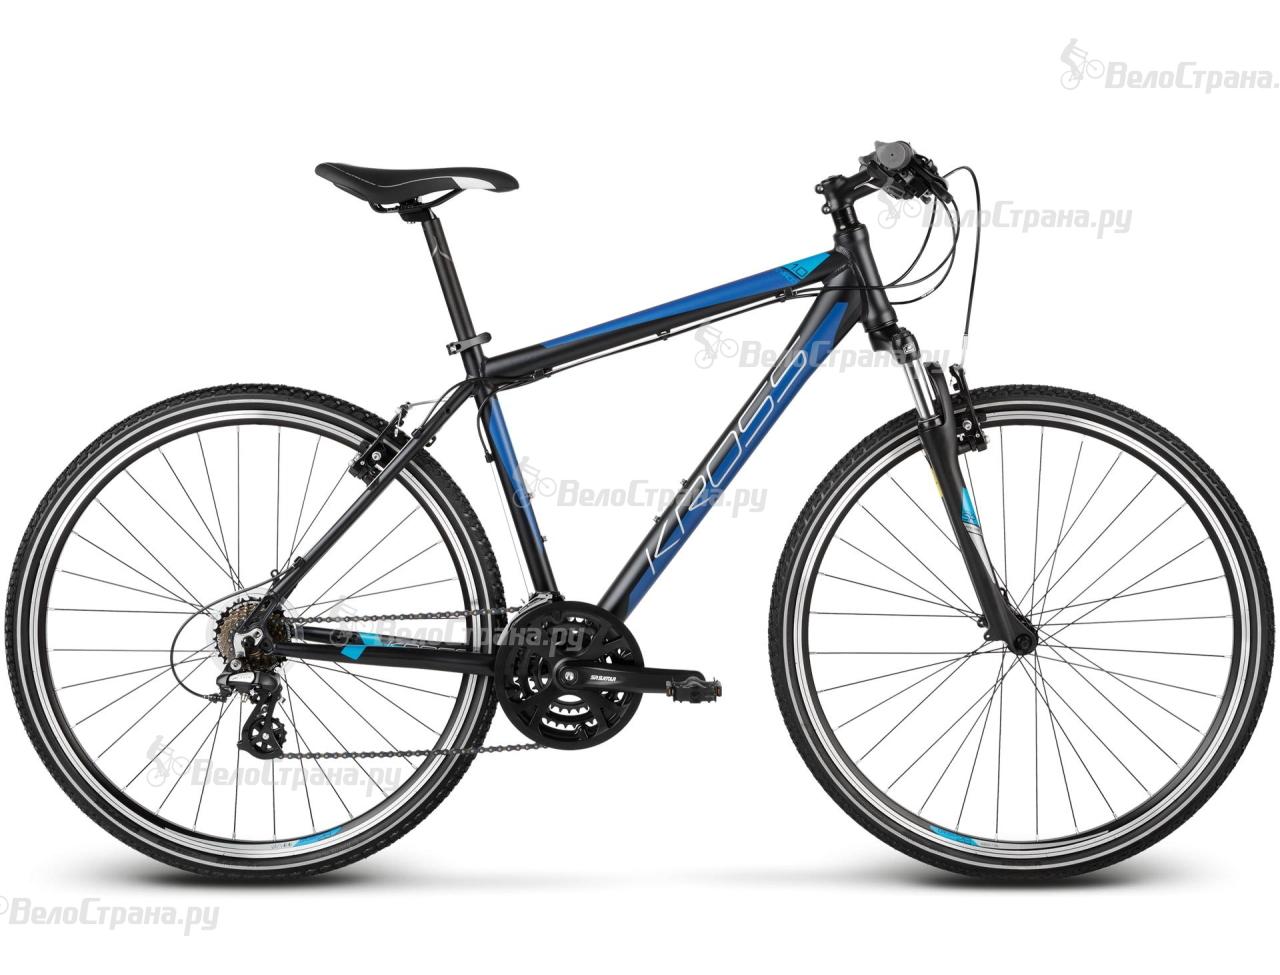 Велосипед Kross Evado 1.0 (2017) велосипед kross evado 1 0 lady 2017